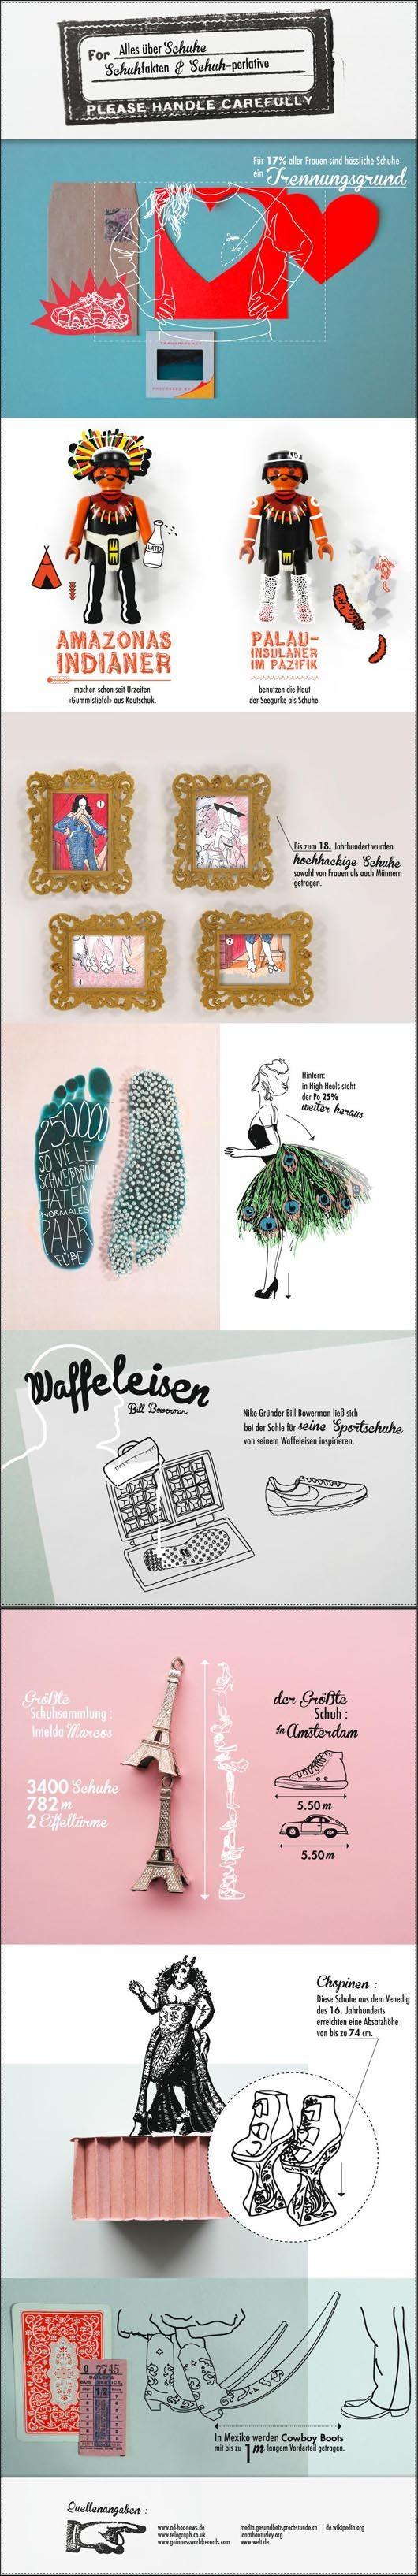 Infografik über Schuhe